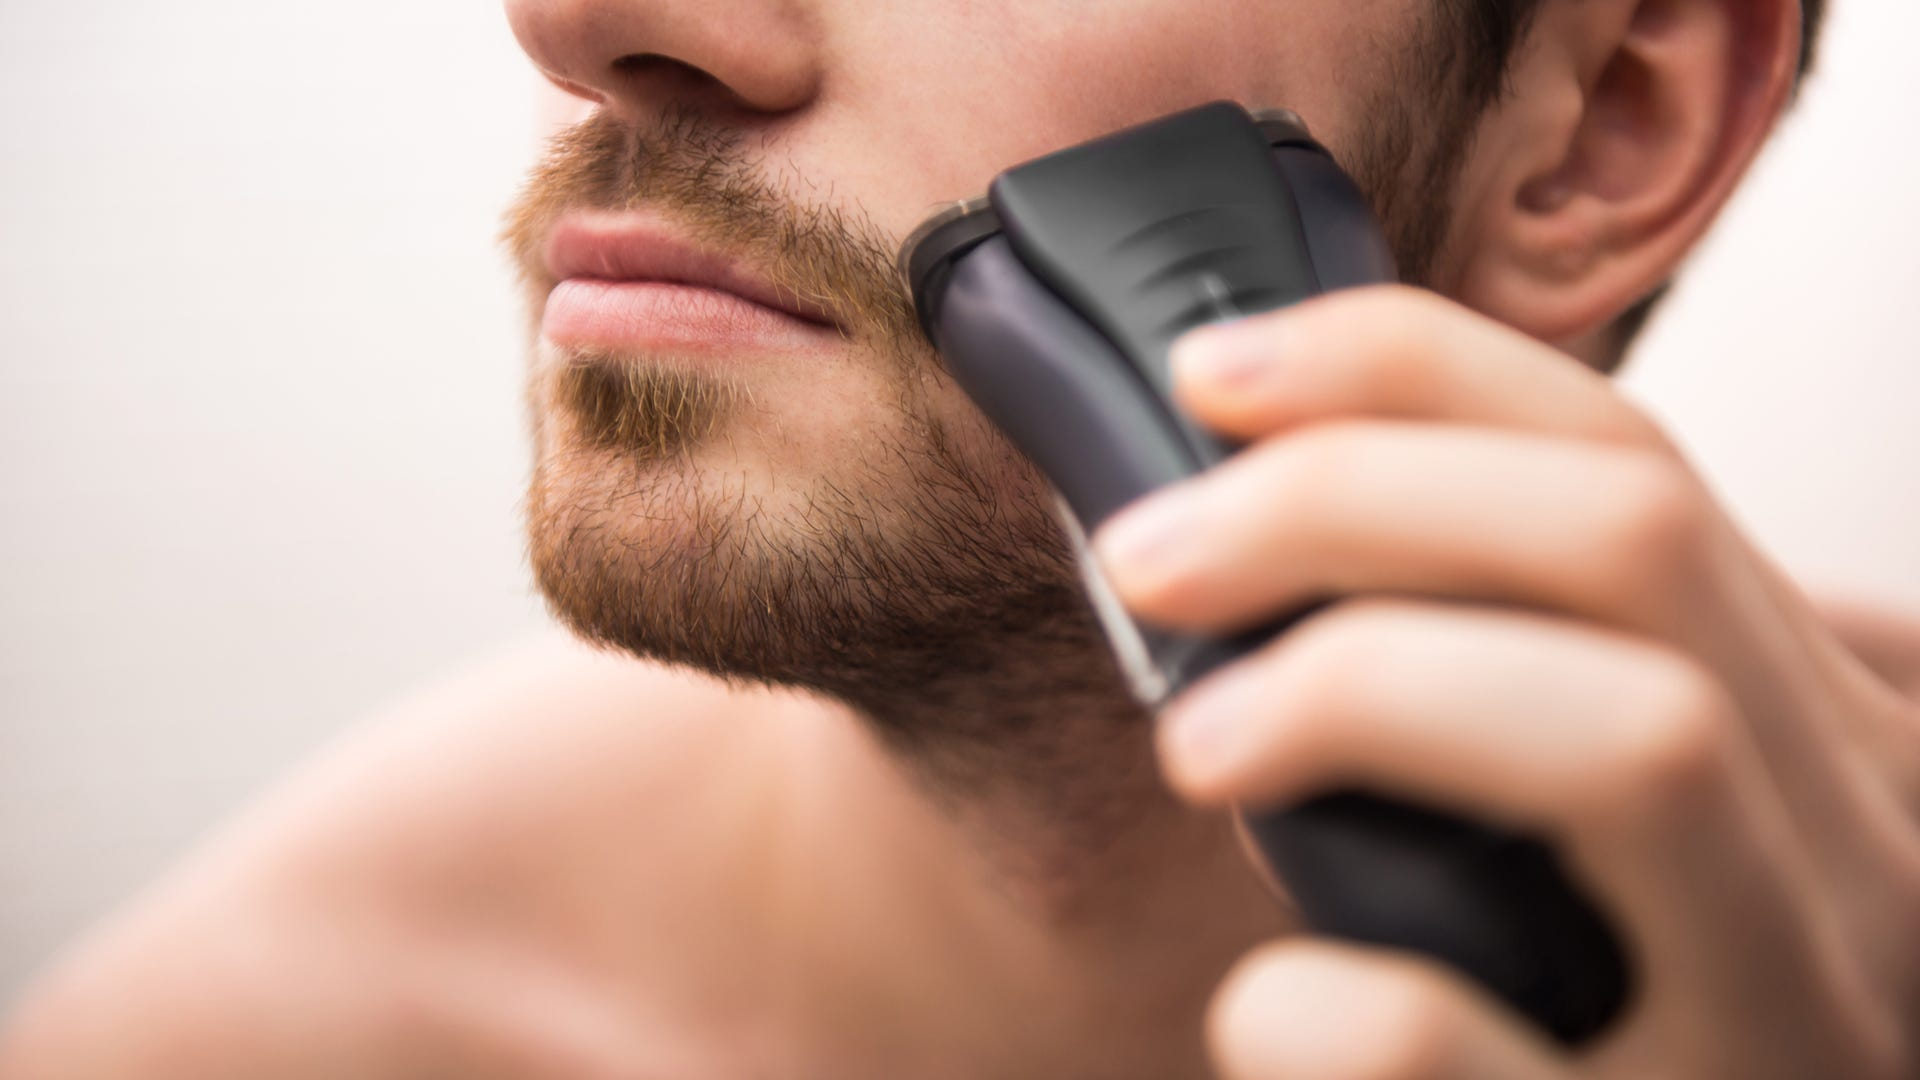 A man uses an electric razor on his beard.